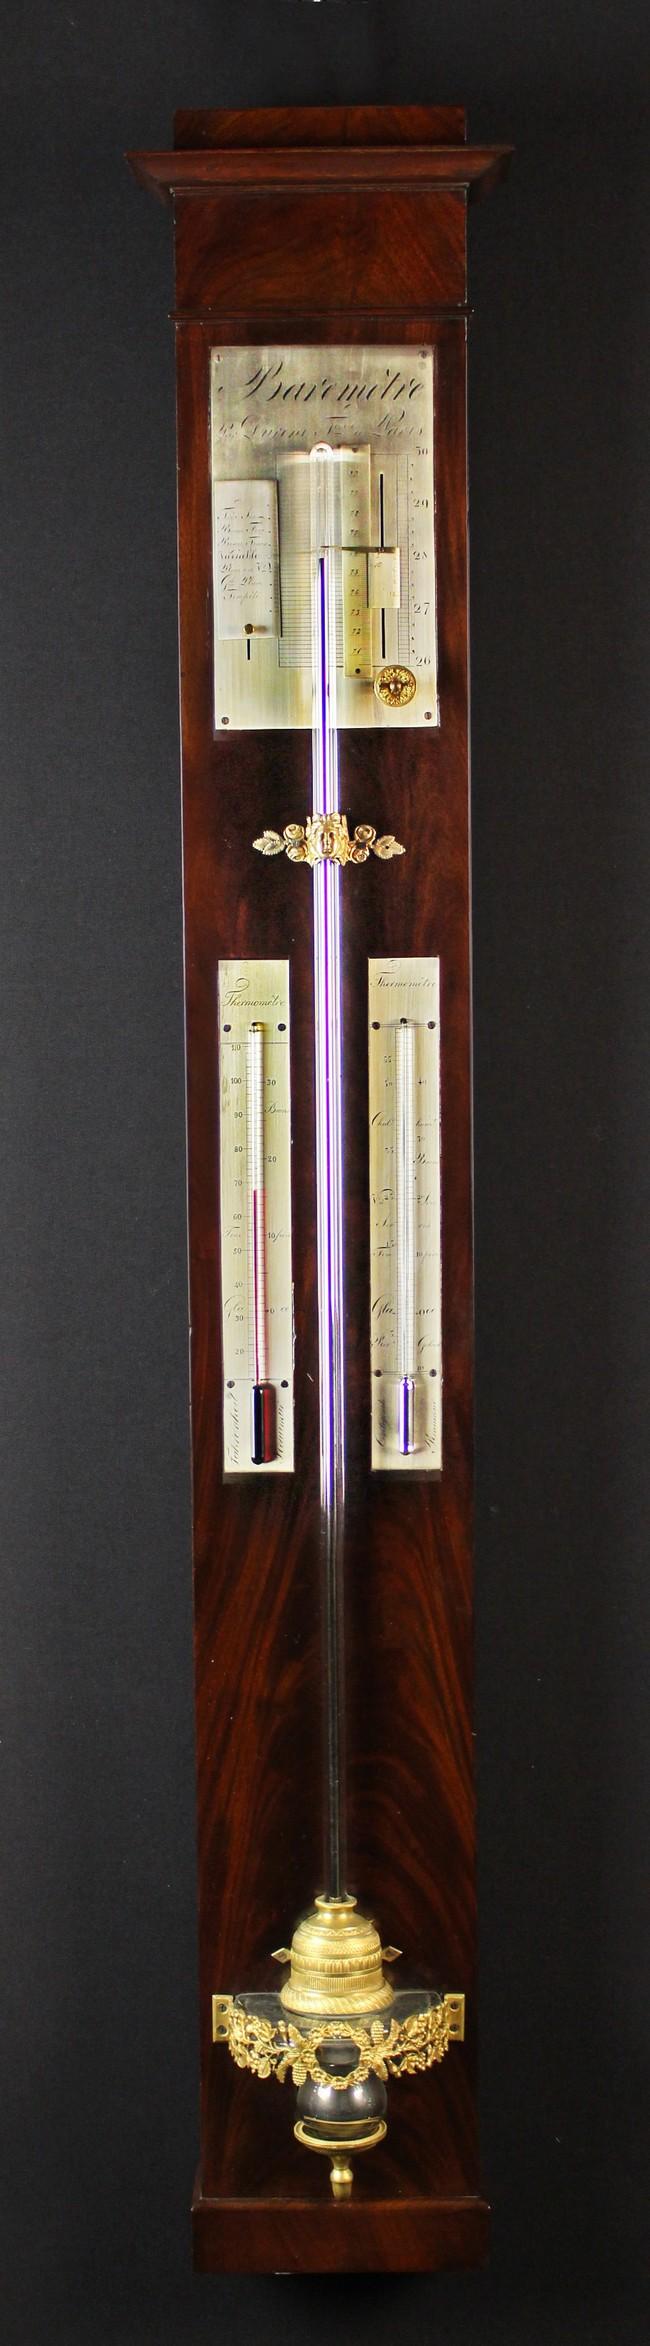 Lot 34 - A Fine Quality 19th Century French Barometer by Duroni Frères à Paris.